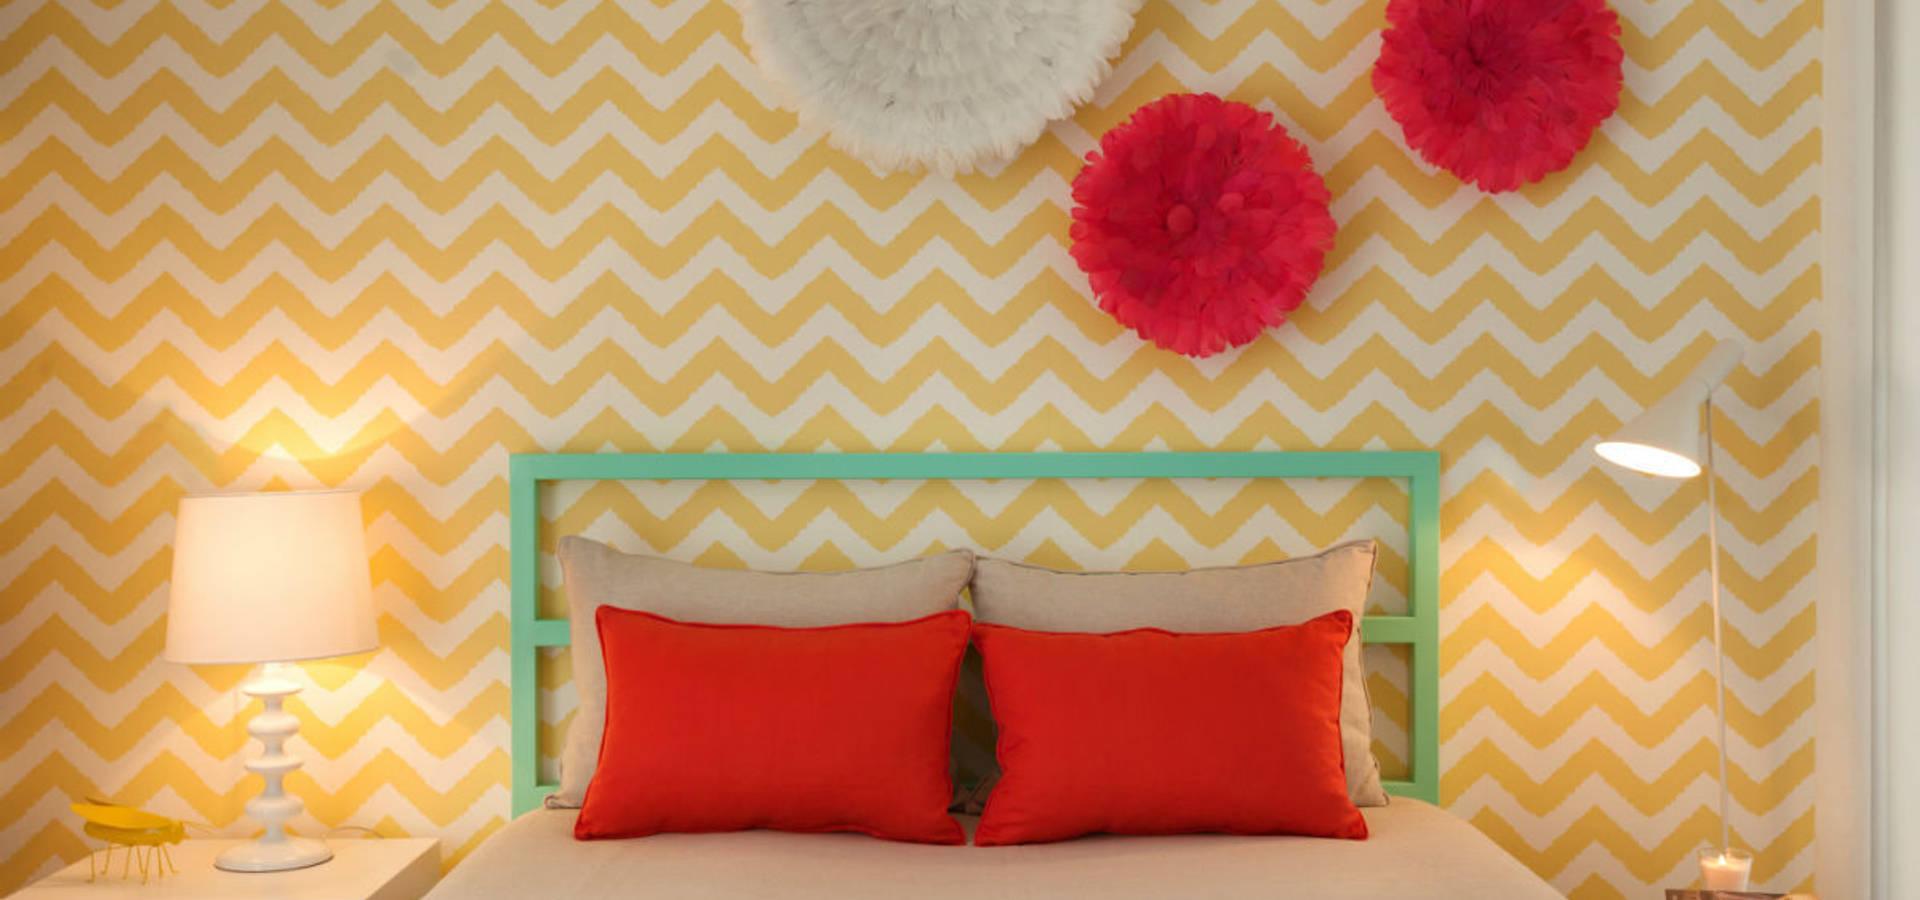 Ana Rita Soares- Design de Interiores